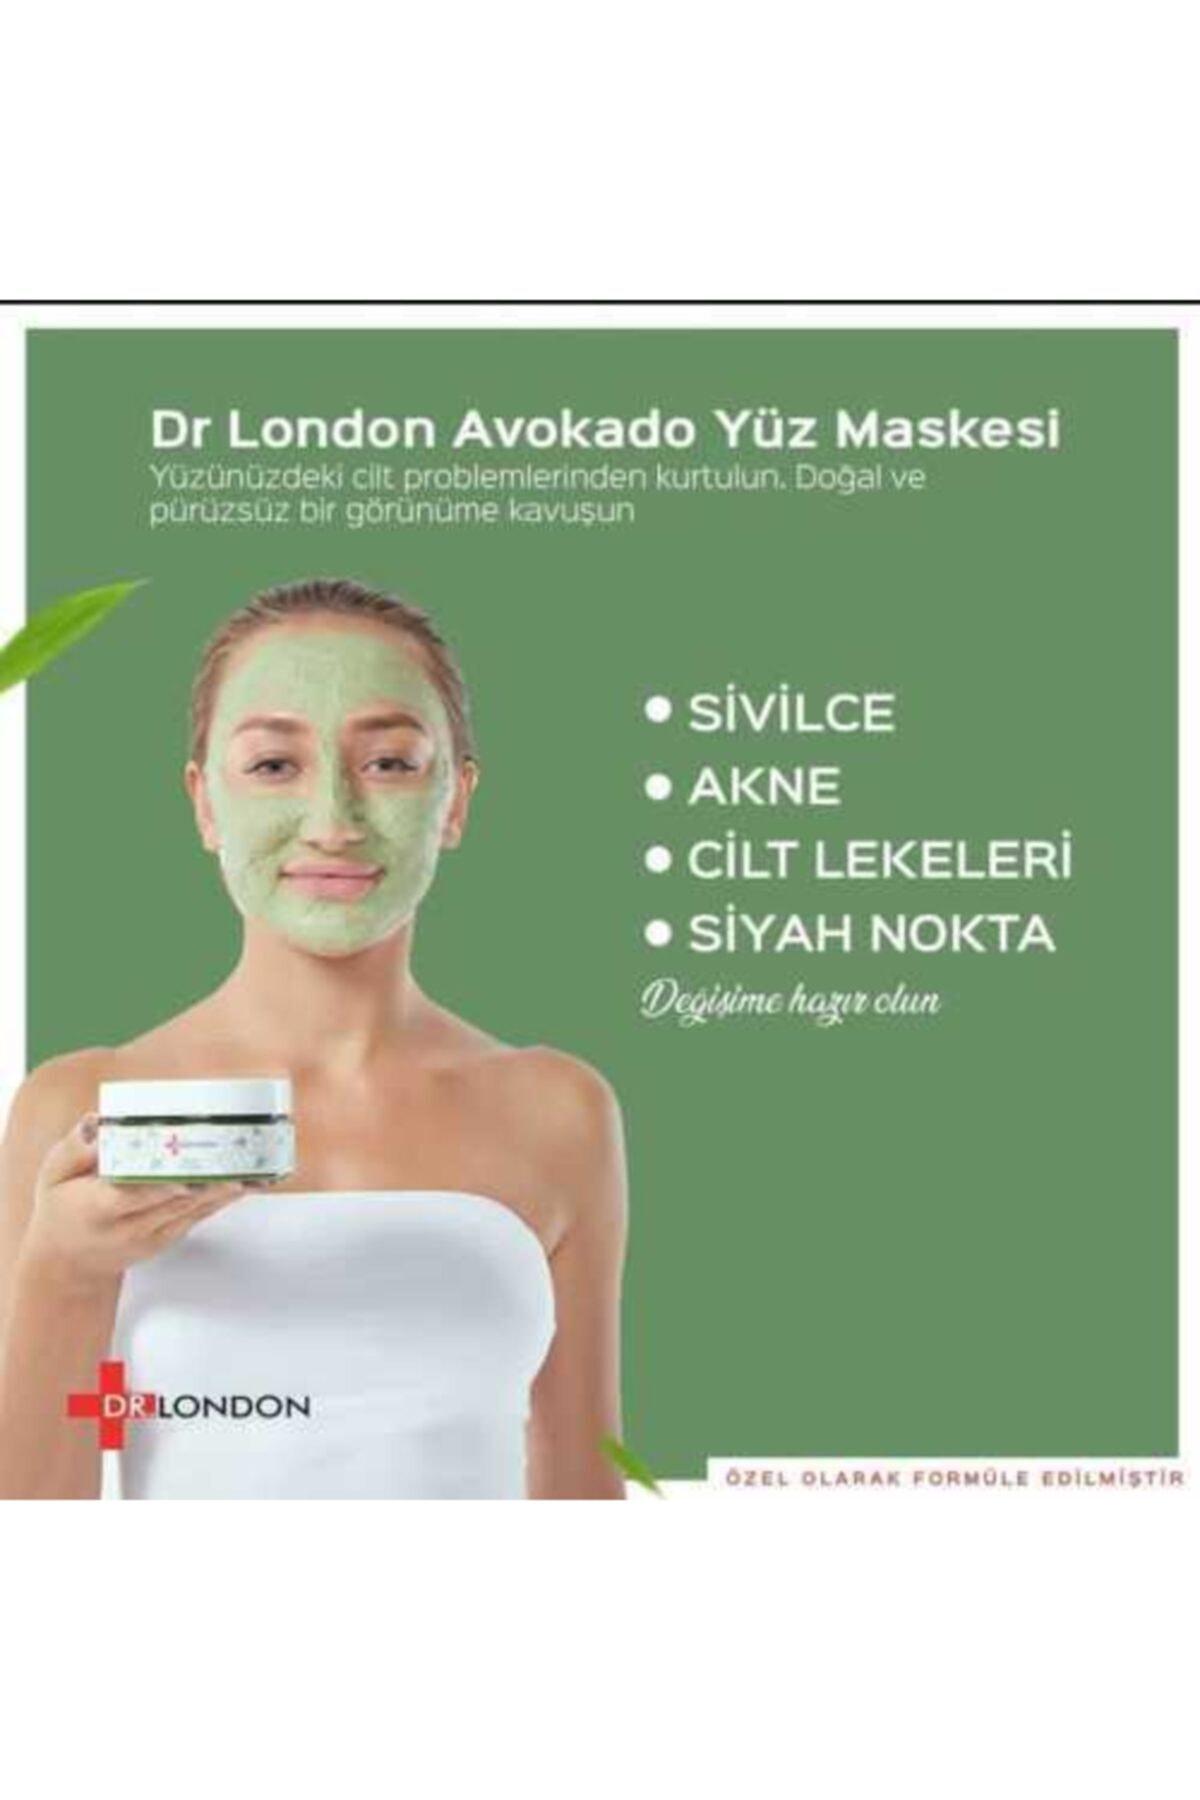 DrLondon Dr.london Avokado Maskesi 1 Kutu 2